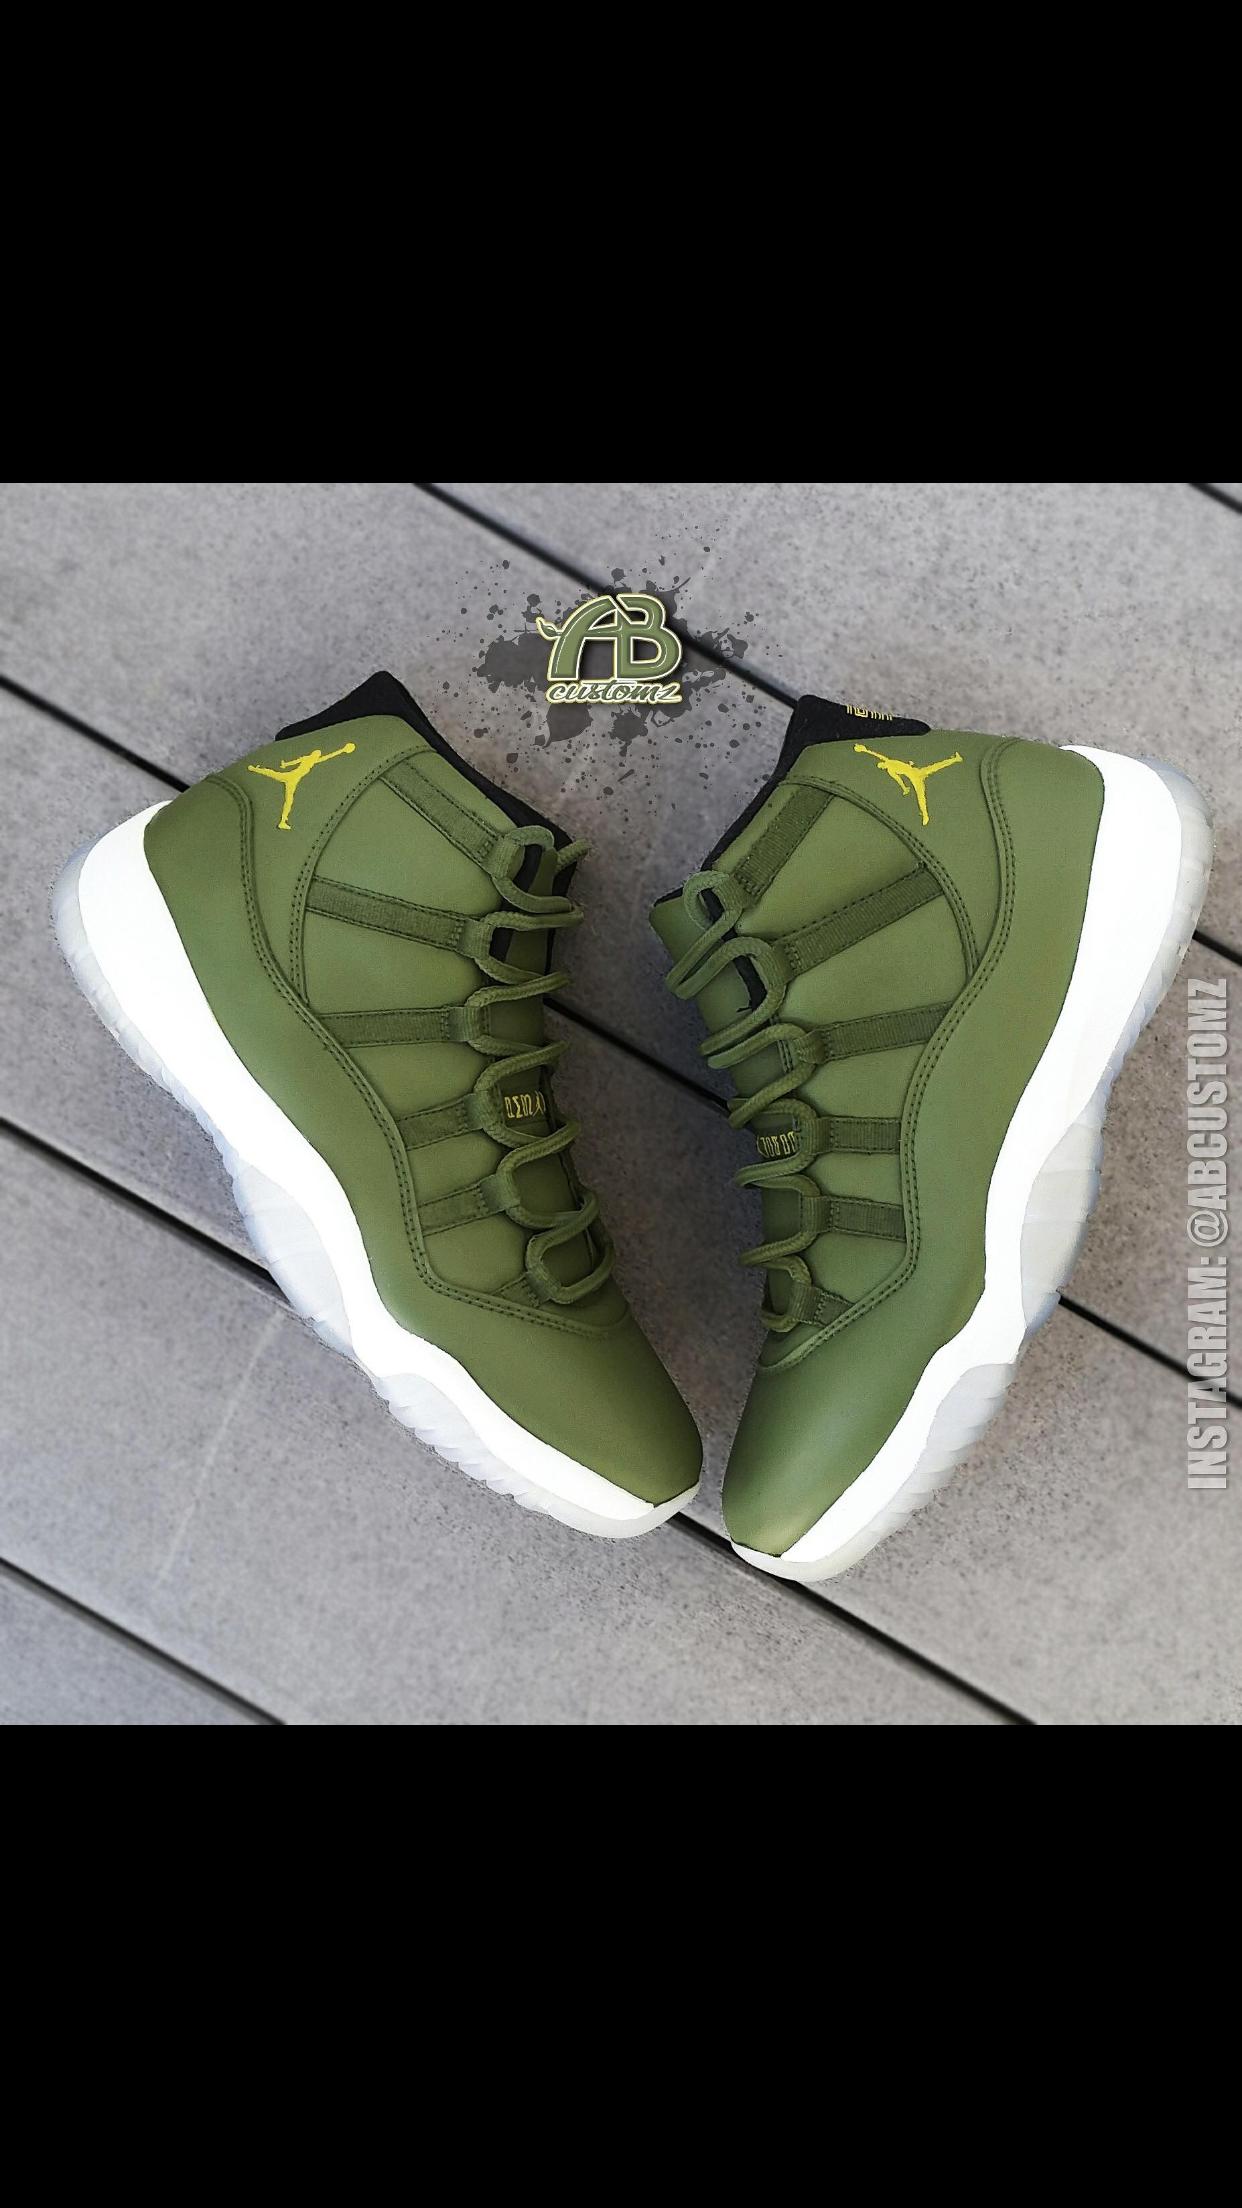 c5adf965c17ec3  DiscountBasketballEquipment Jordan Basketball Shoes